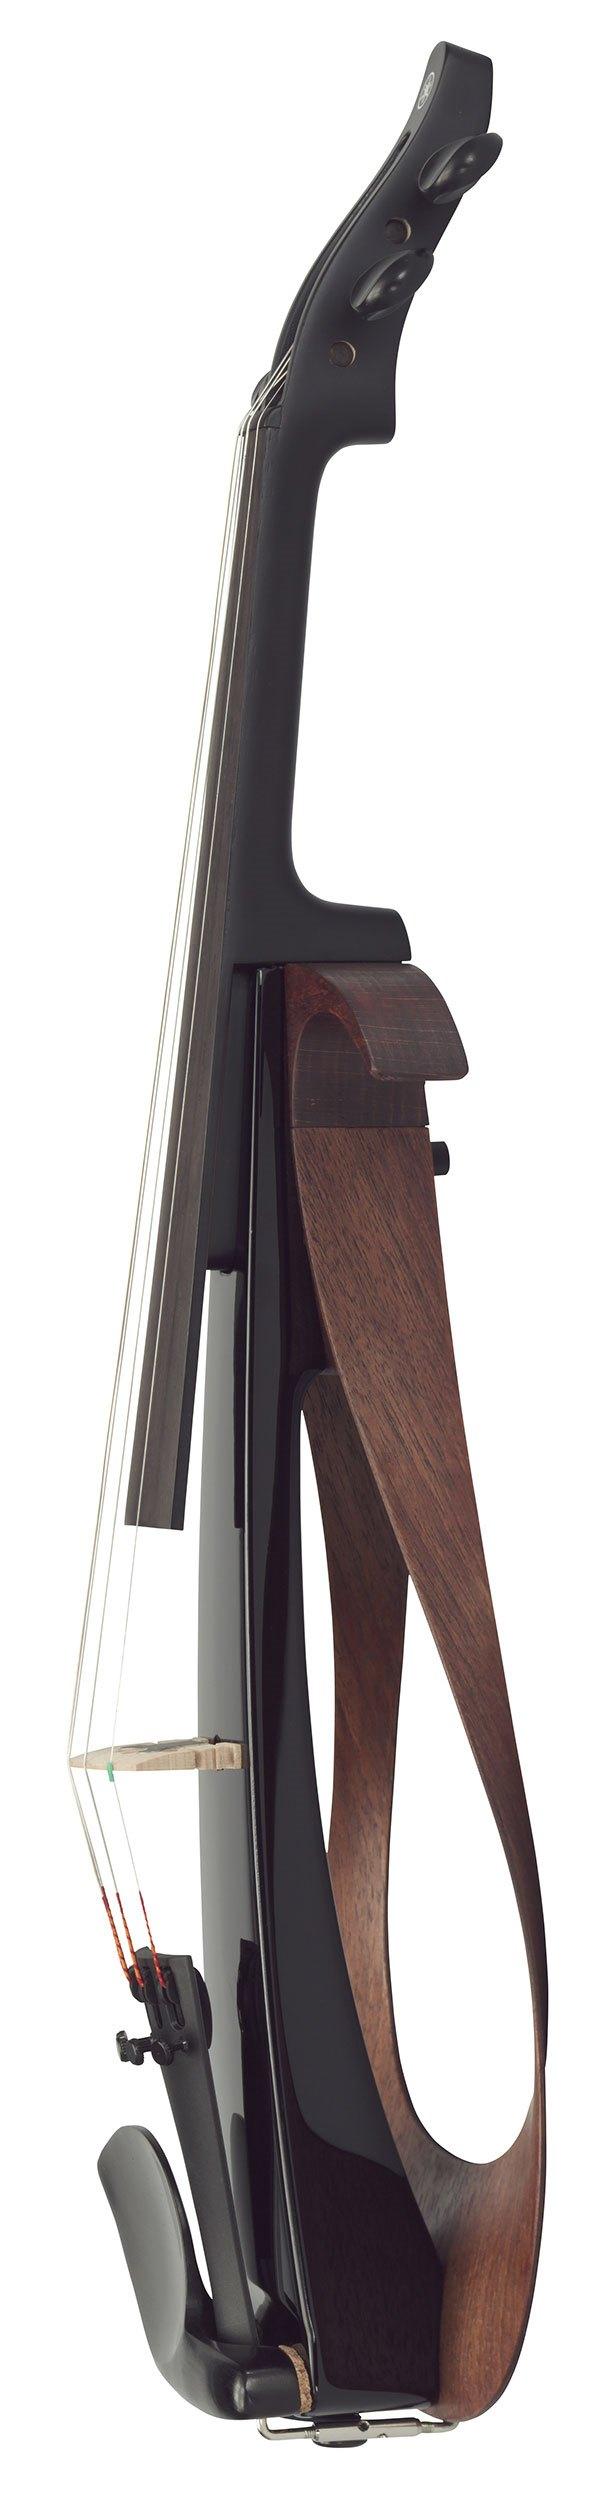 Yamaha - MrSilverTrumpet YEV-105NT